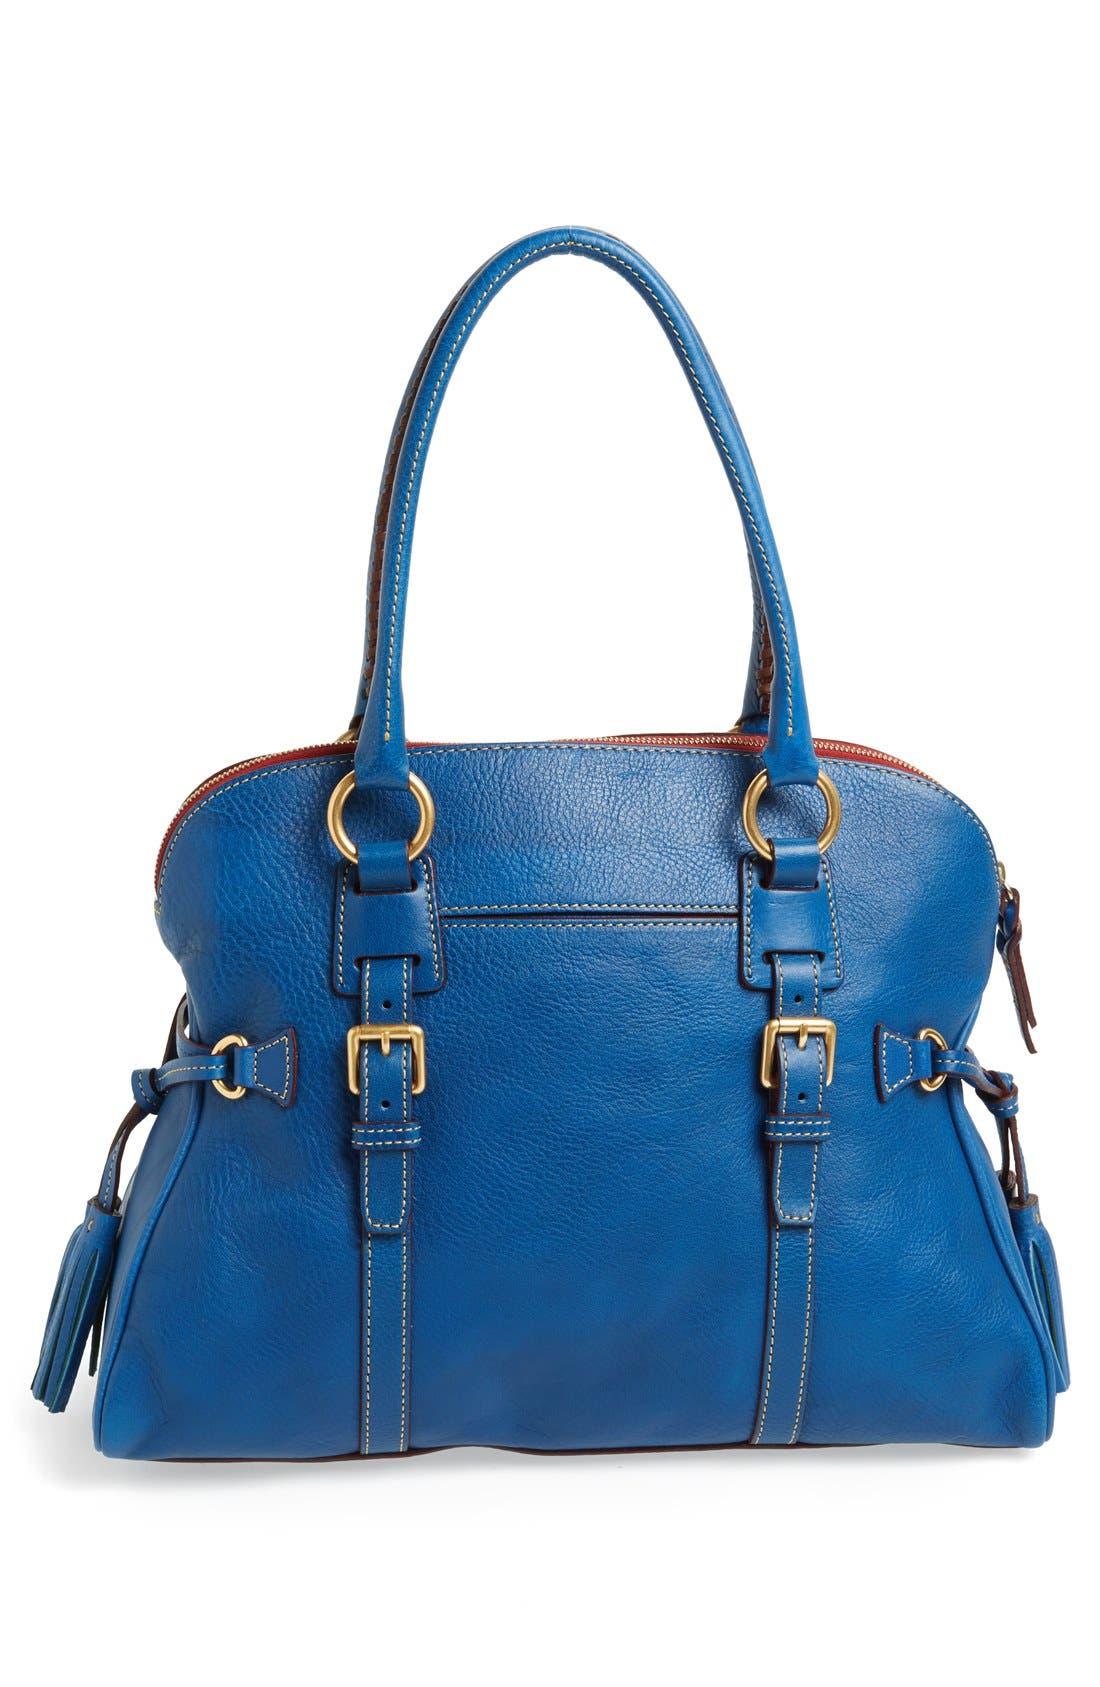 Alternate Image 3  - Dooney & Bourke 'Florentine Collection' Domed Leather Buckle Satchel